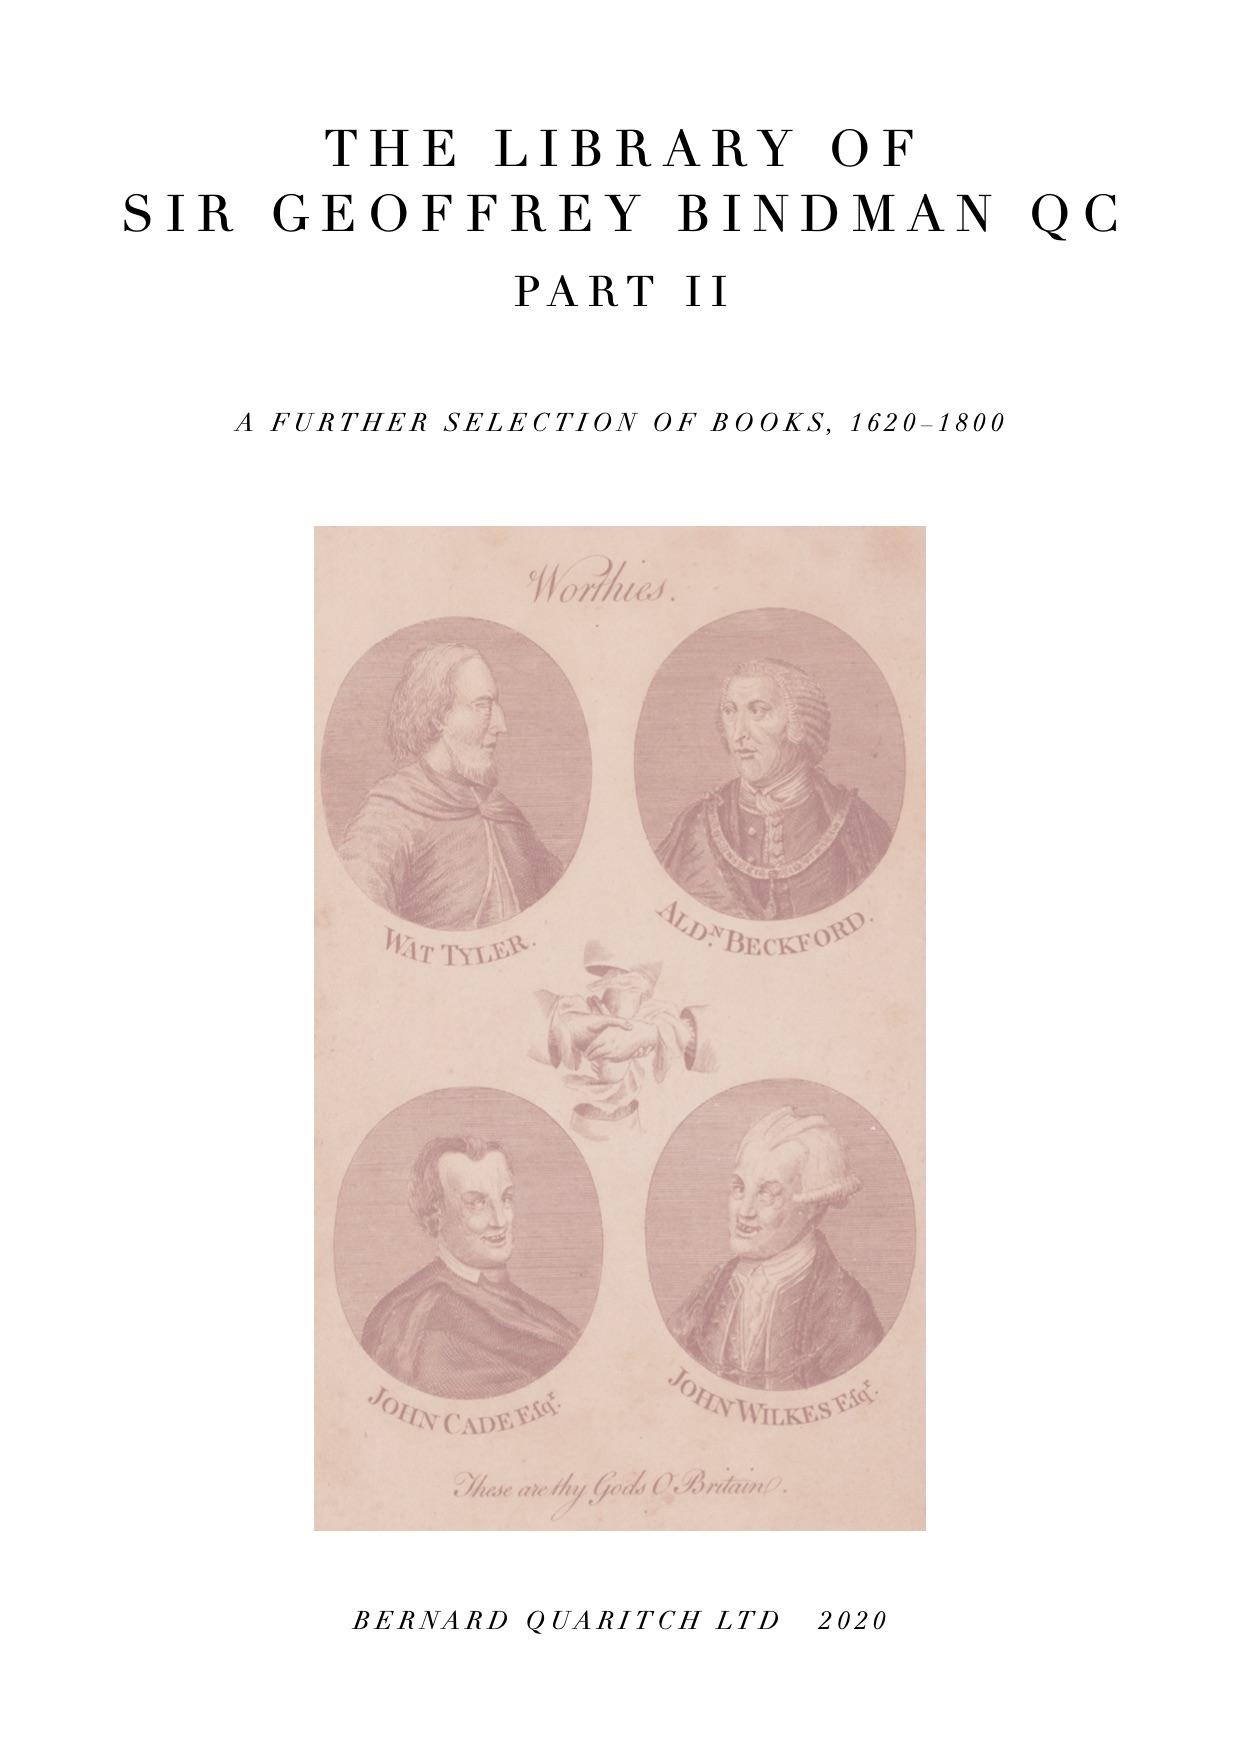 The Library of Sir Geoffrey Bindman Part II, 1620-1800